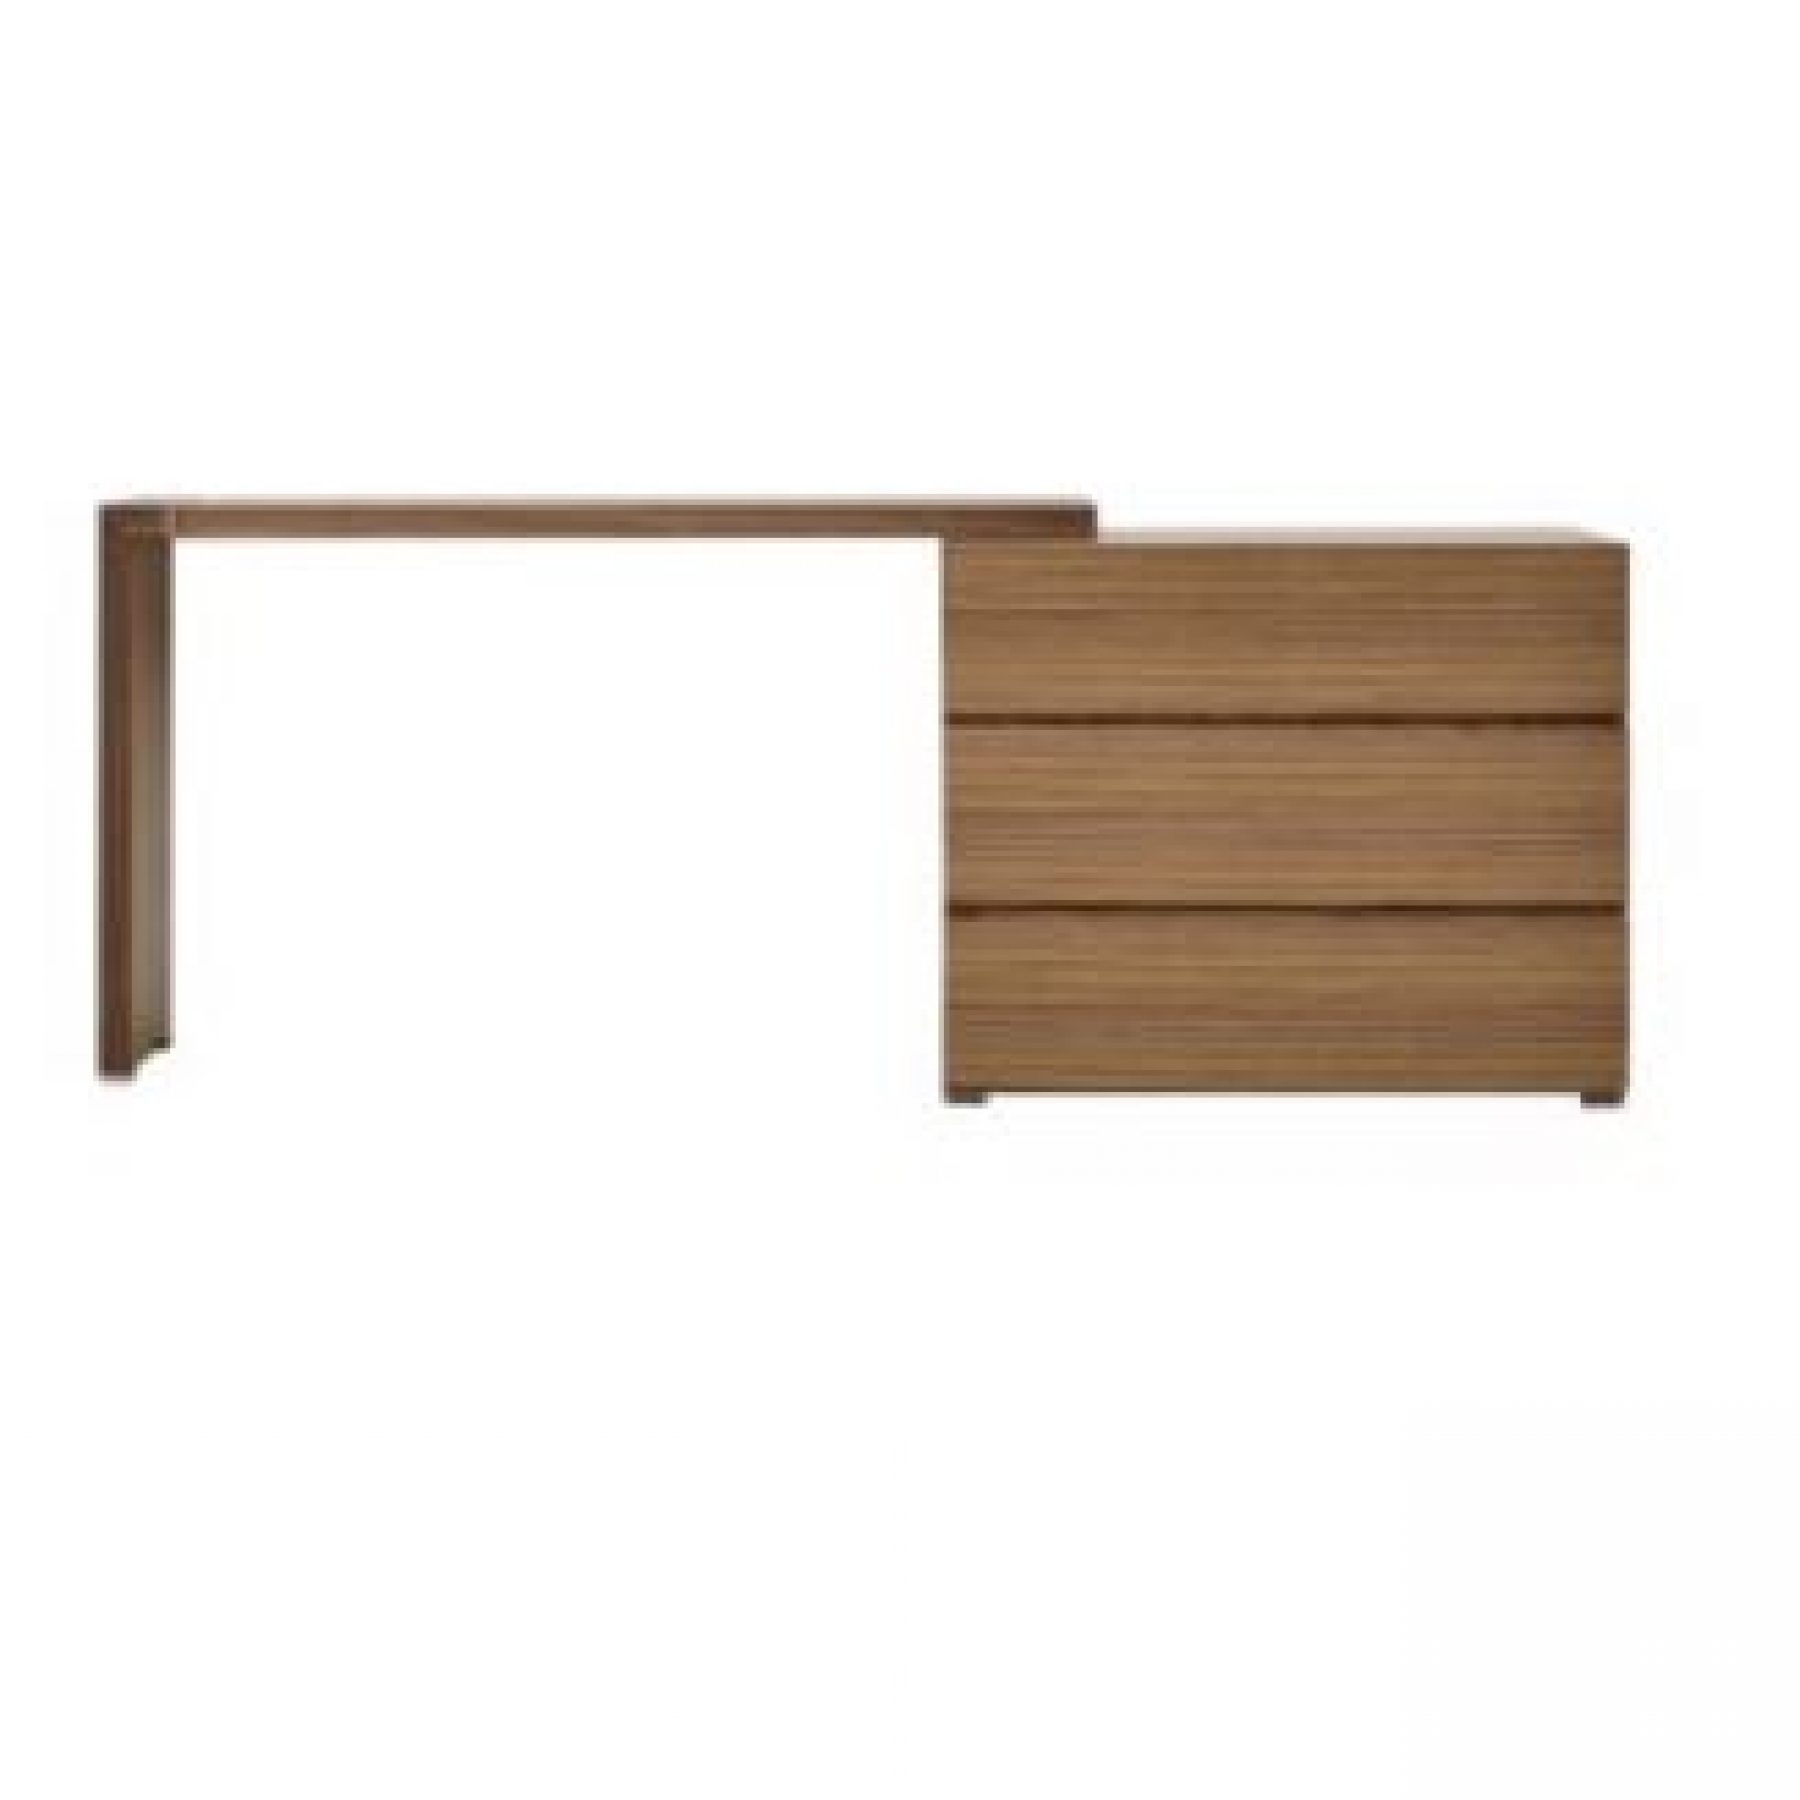 Warehouse Clearance- Cassetti Dresser Chest& Desk Set